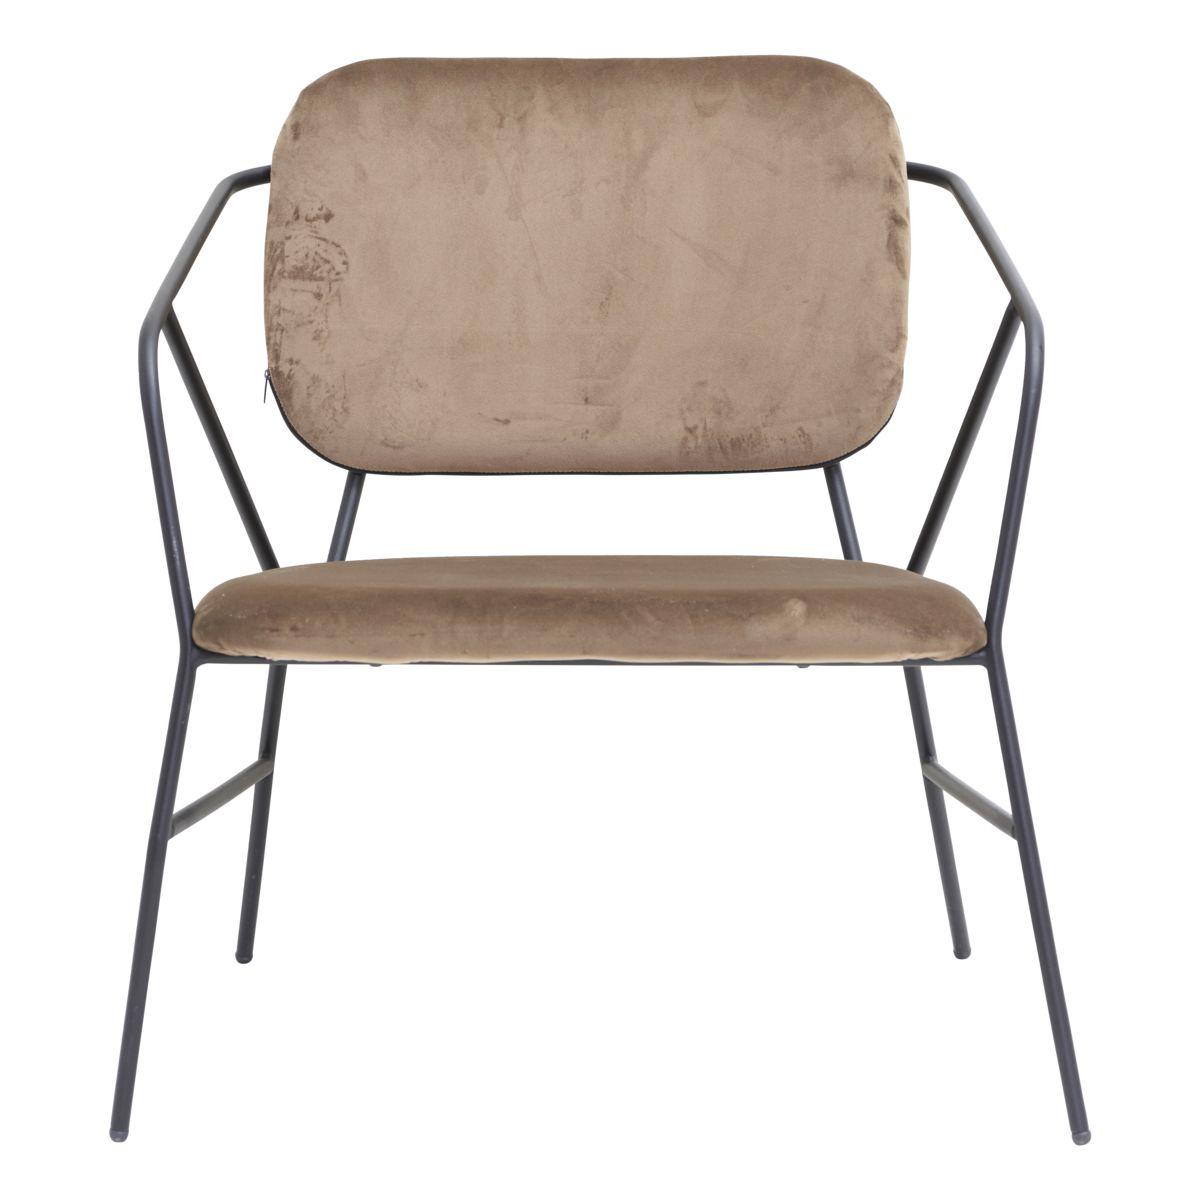 Image of   House Doctor Lounge stol, Klever, Brun